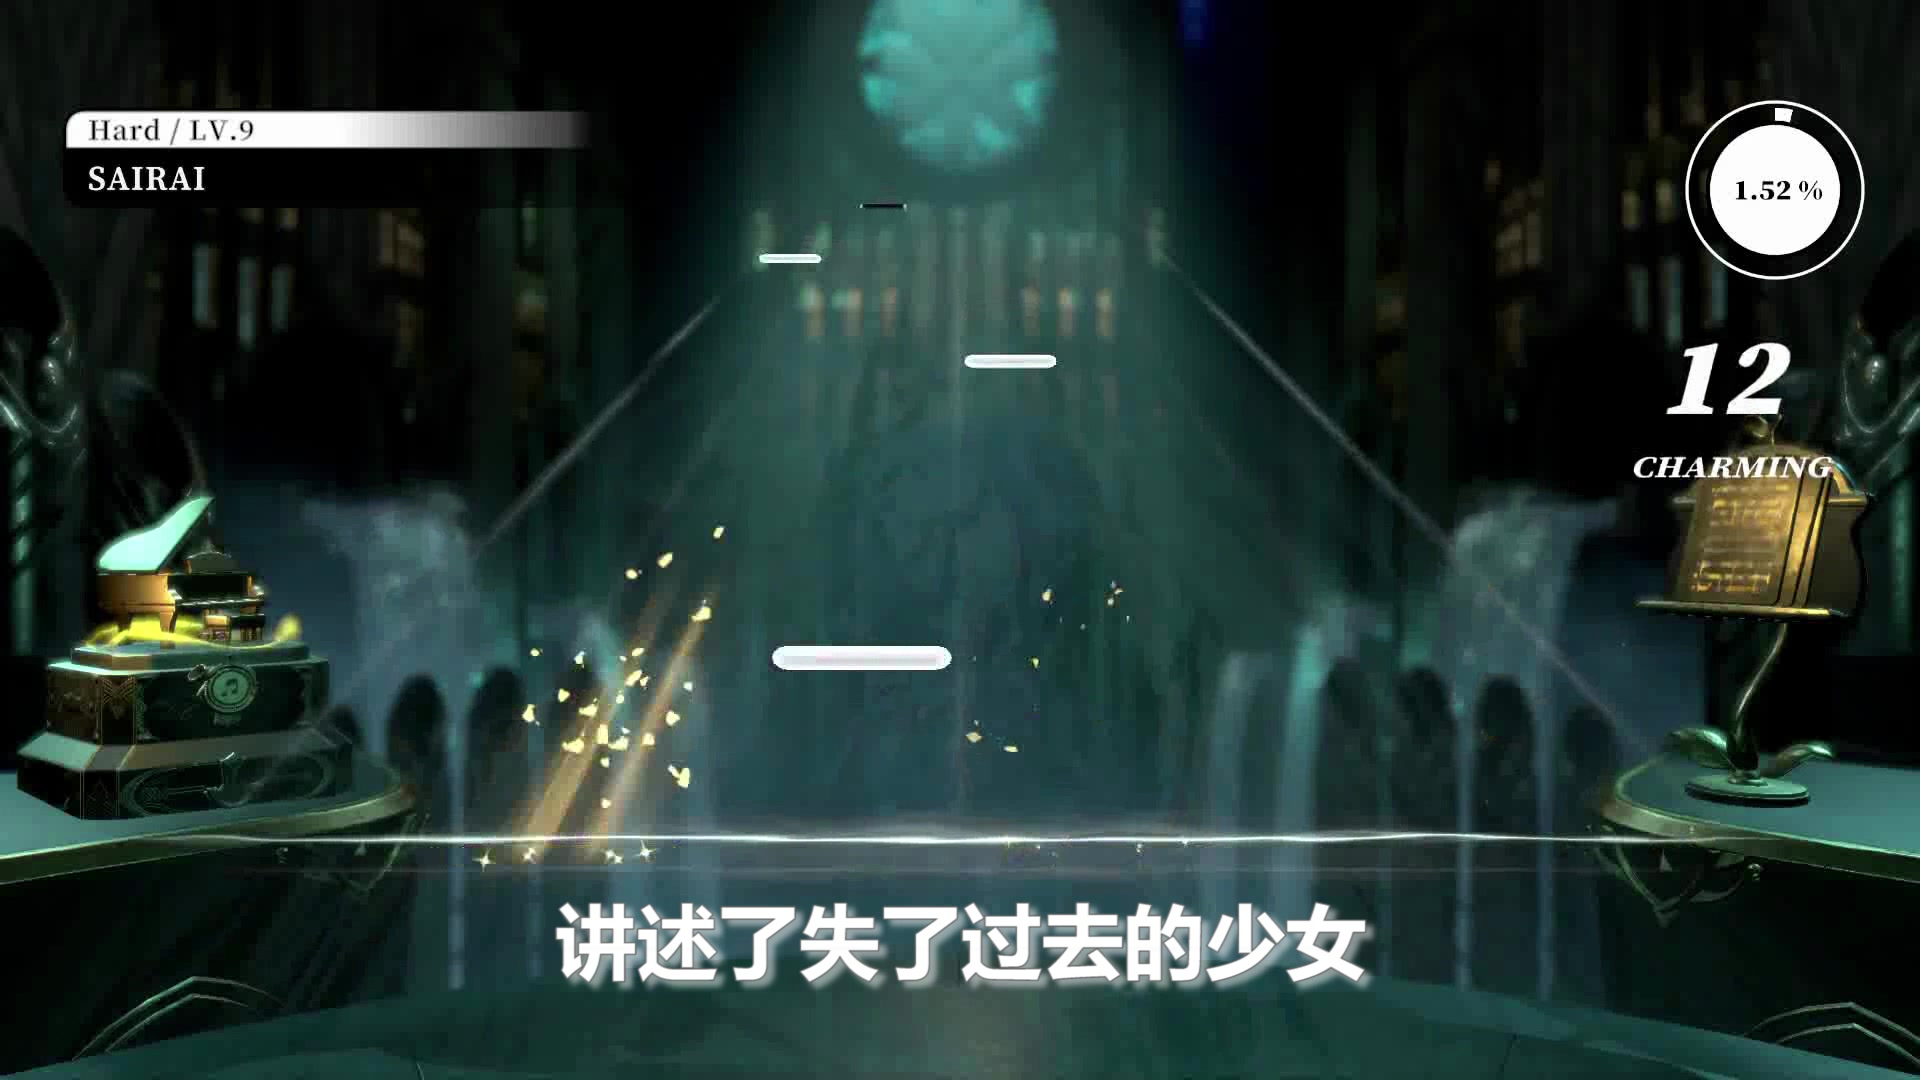 《DEEMO -Reborn-》试玩视频-17173新游秒懂